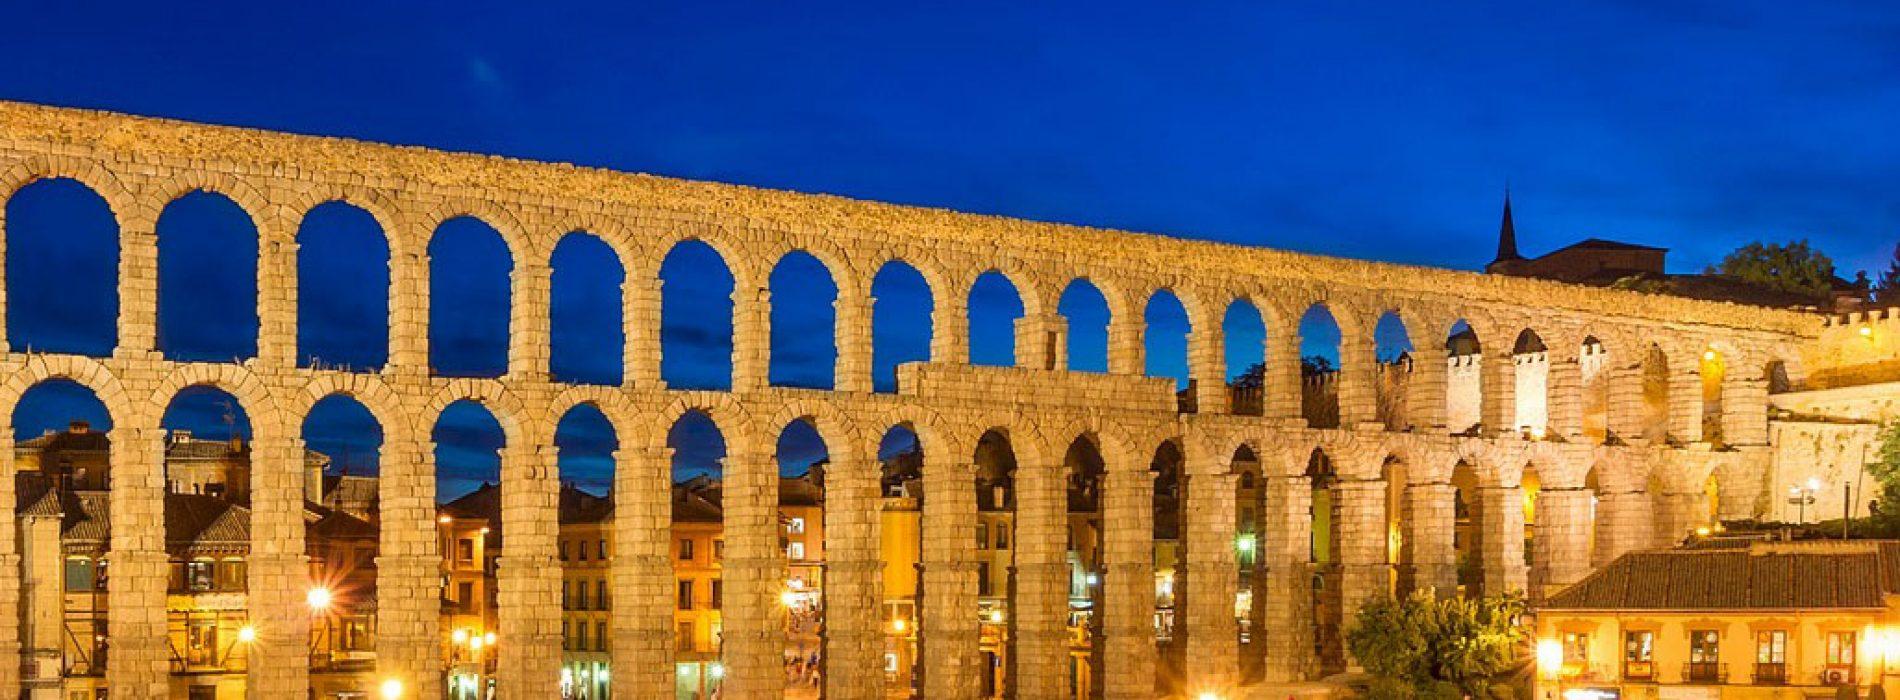 Segovia imponente: un Acueducto con historia